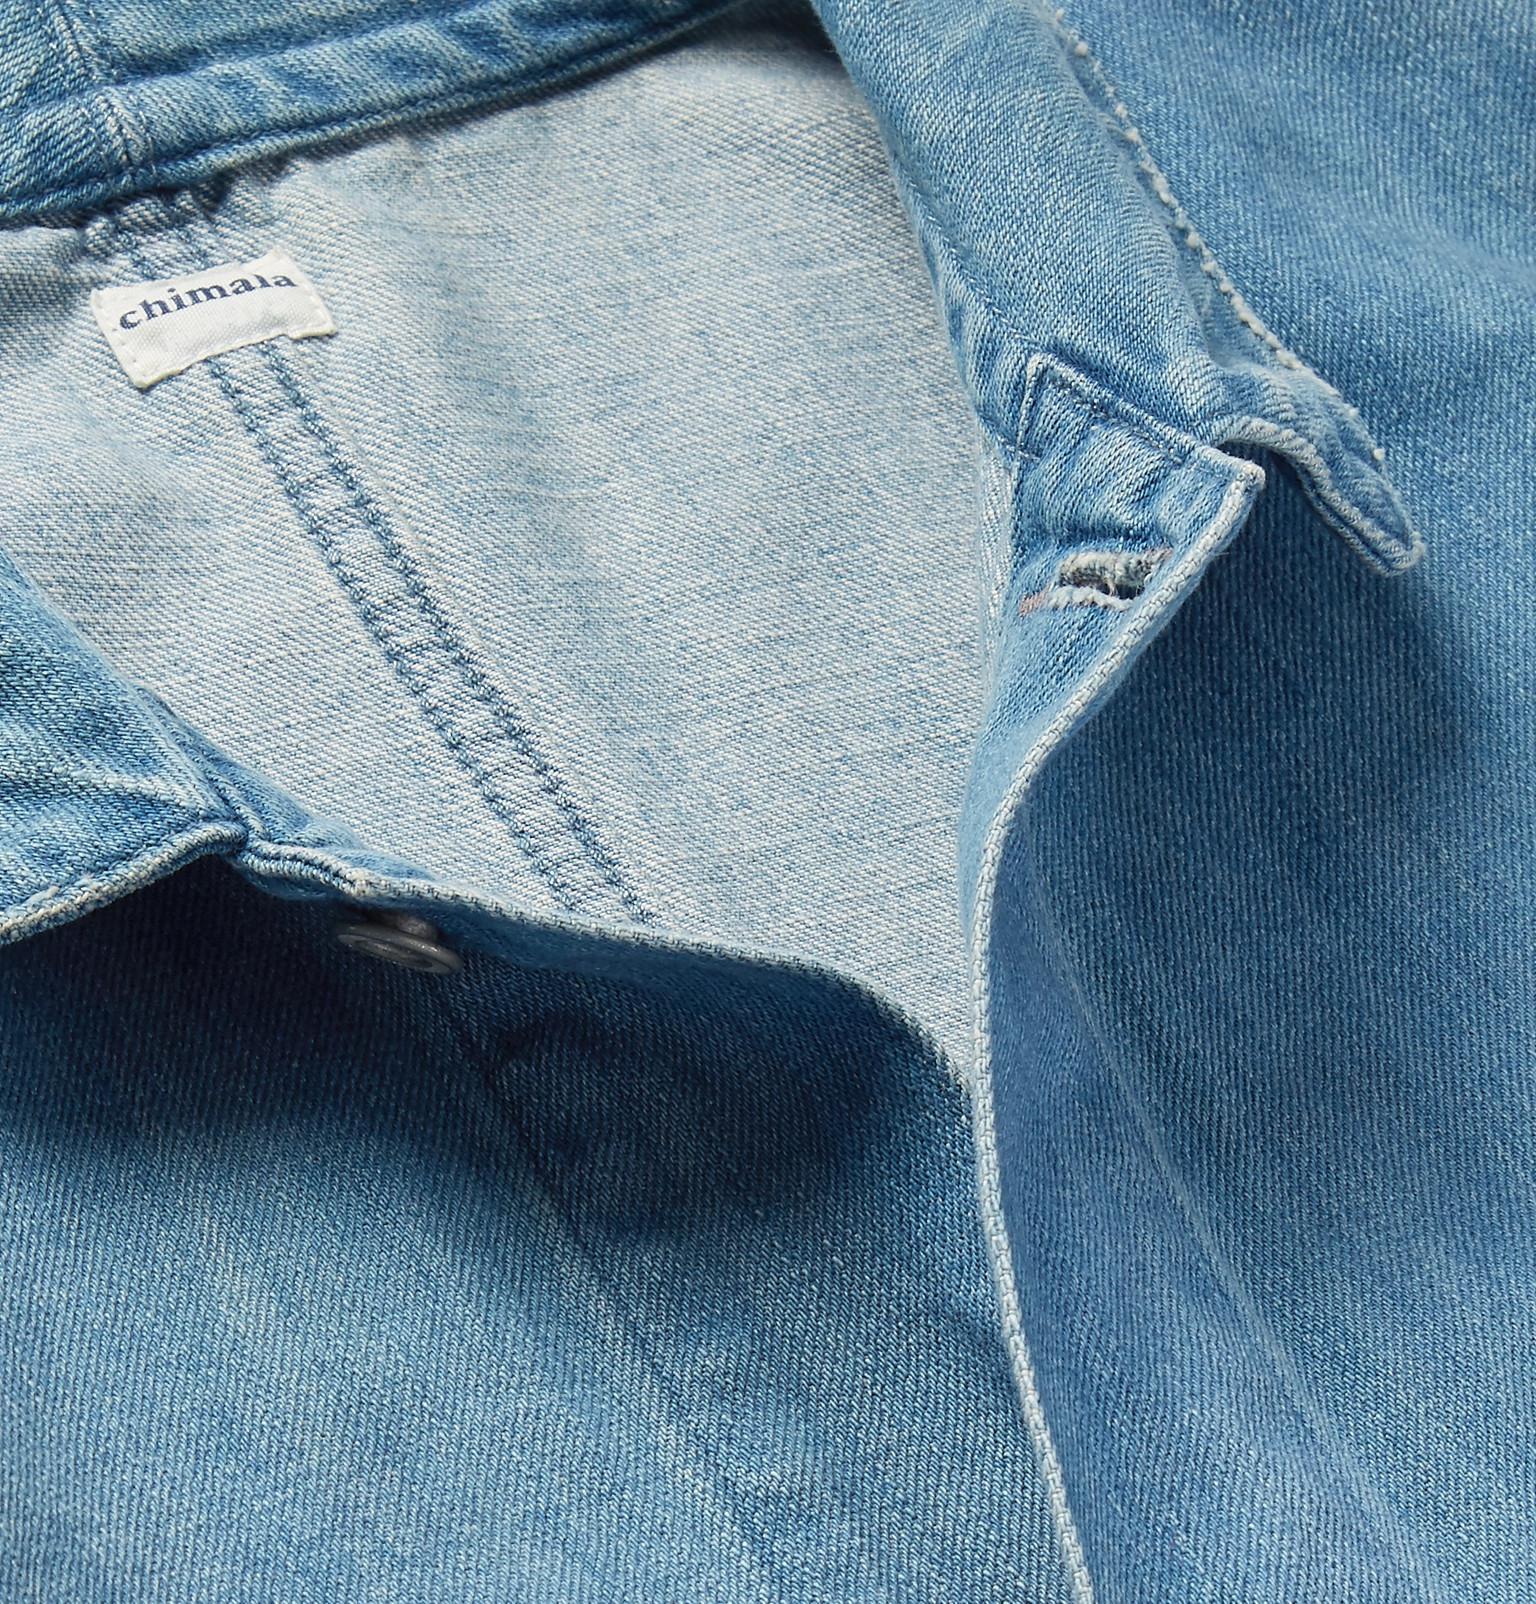 Chimala Distressed Denim Jacket in Blue for Men